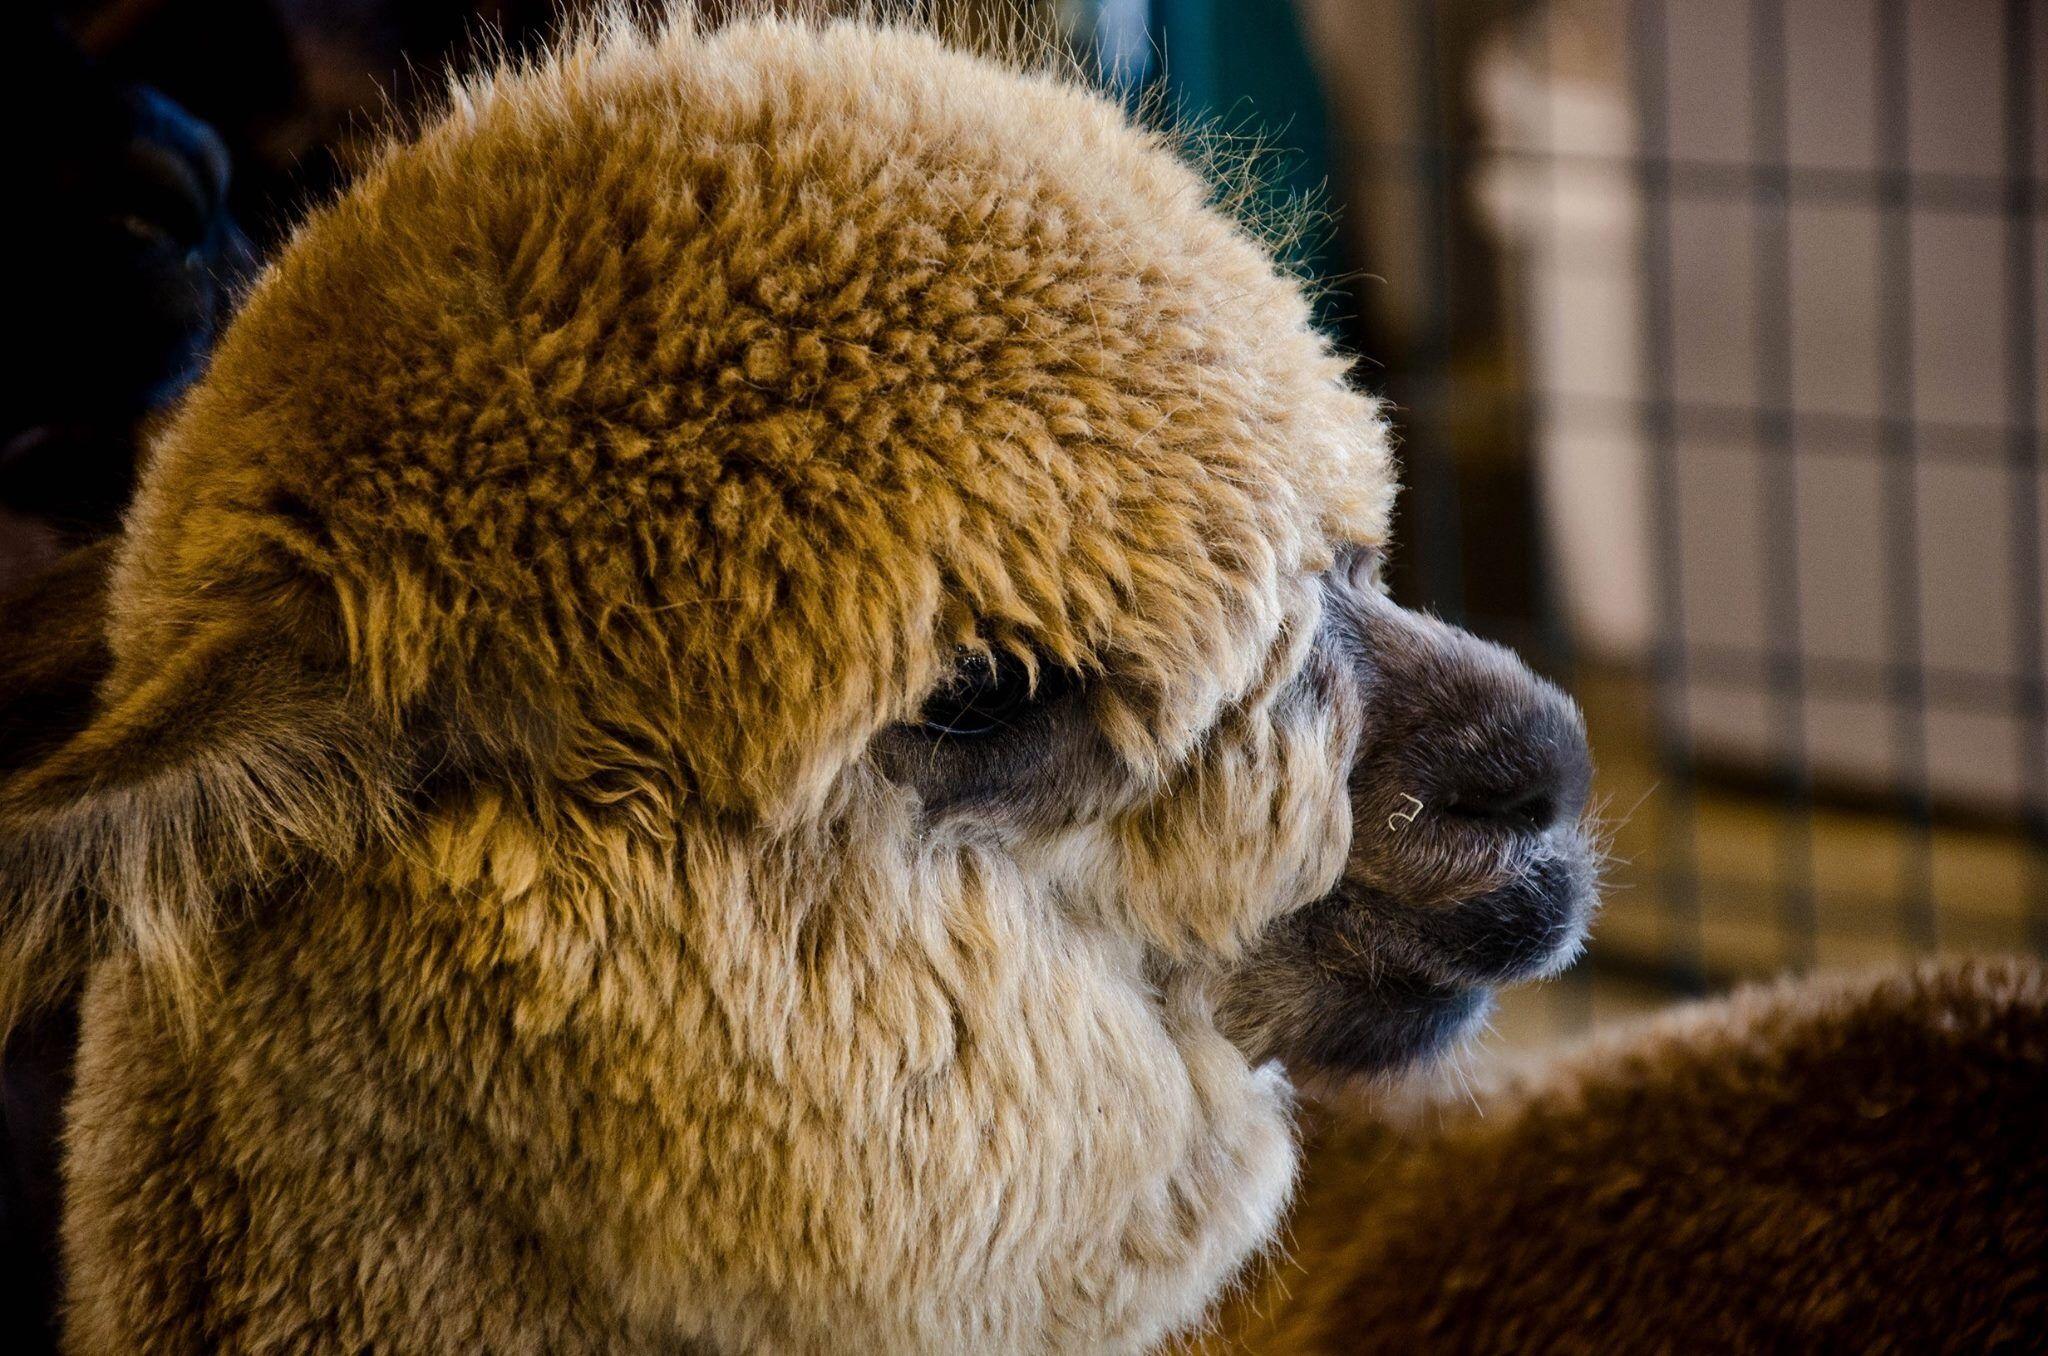 Alpaca by Valerie Dyer